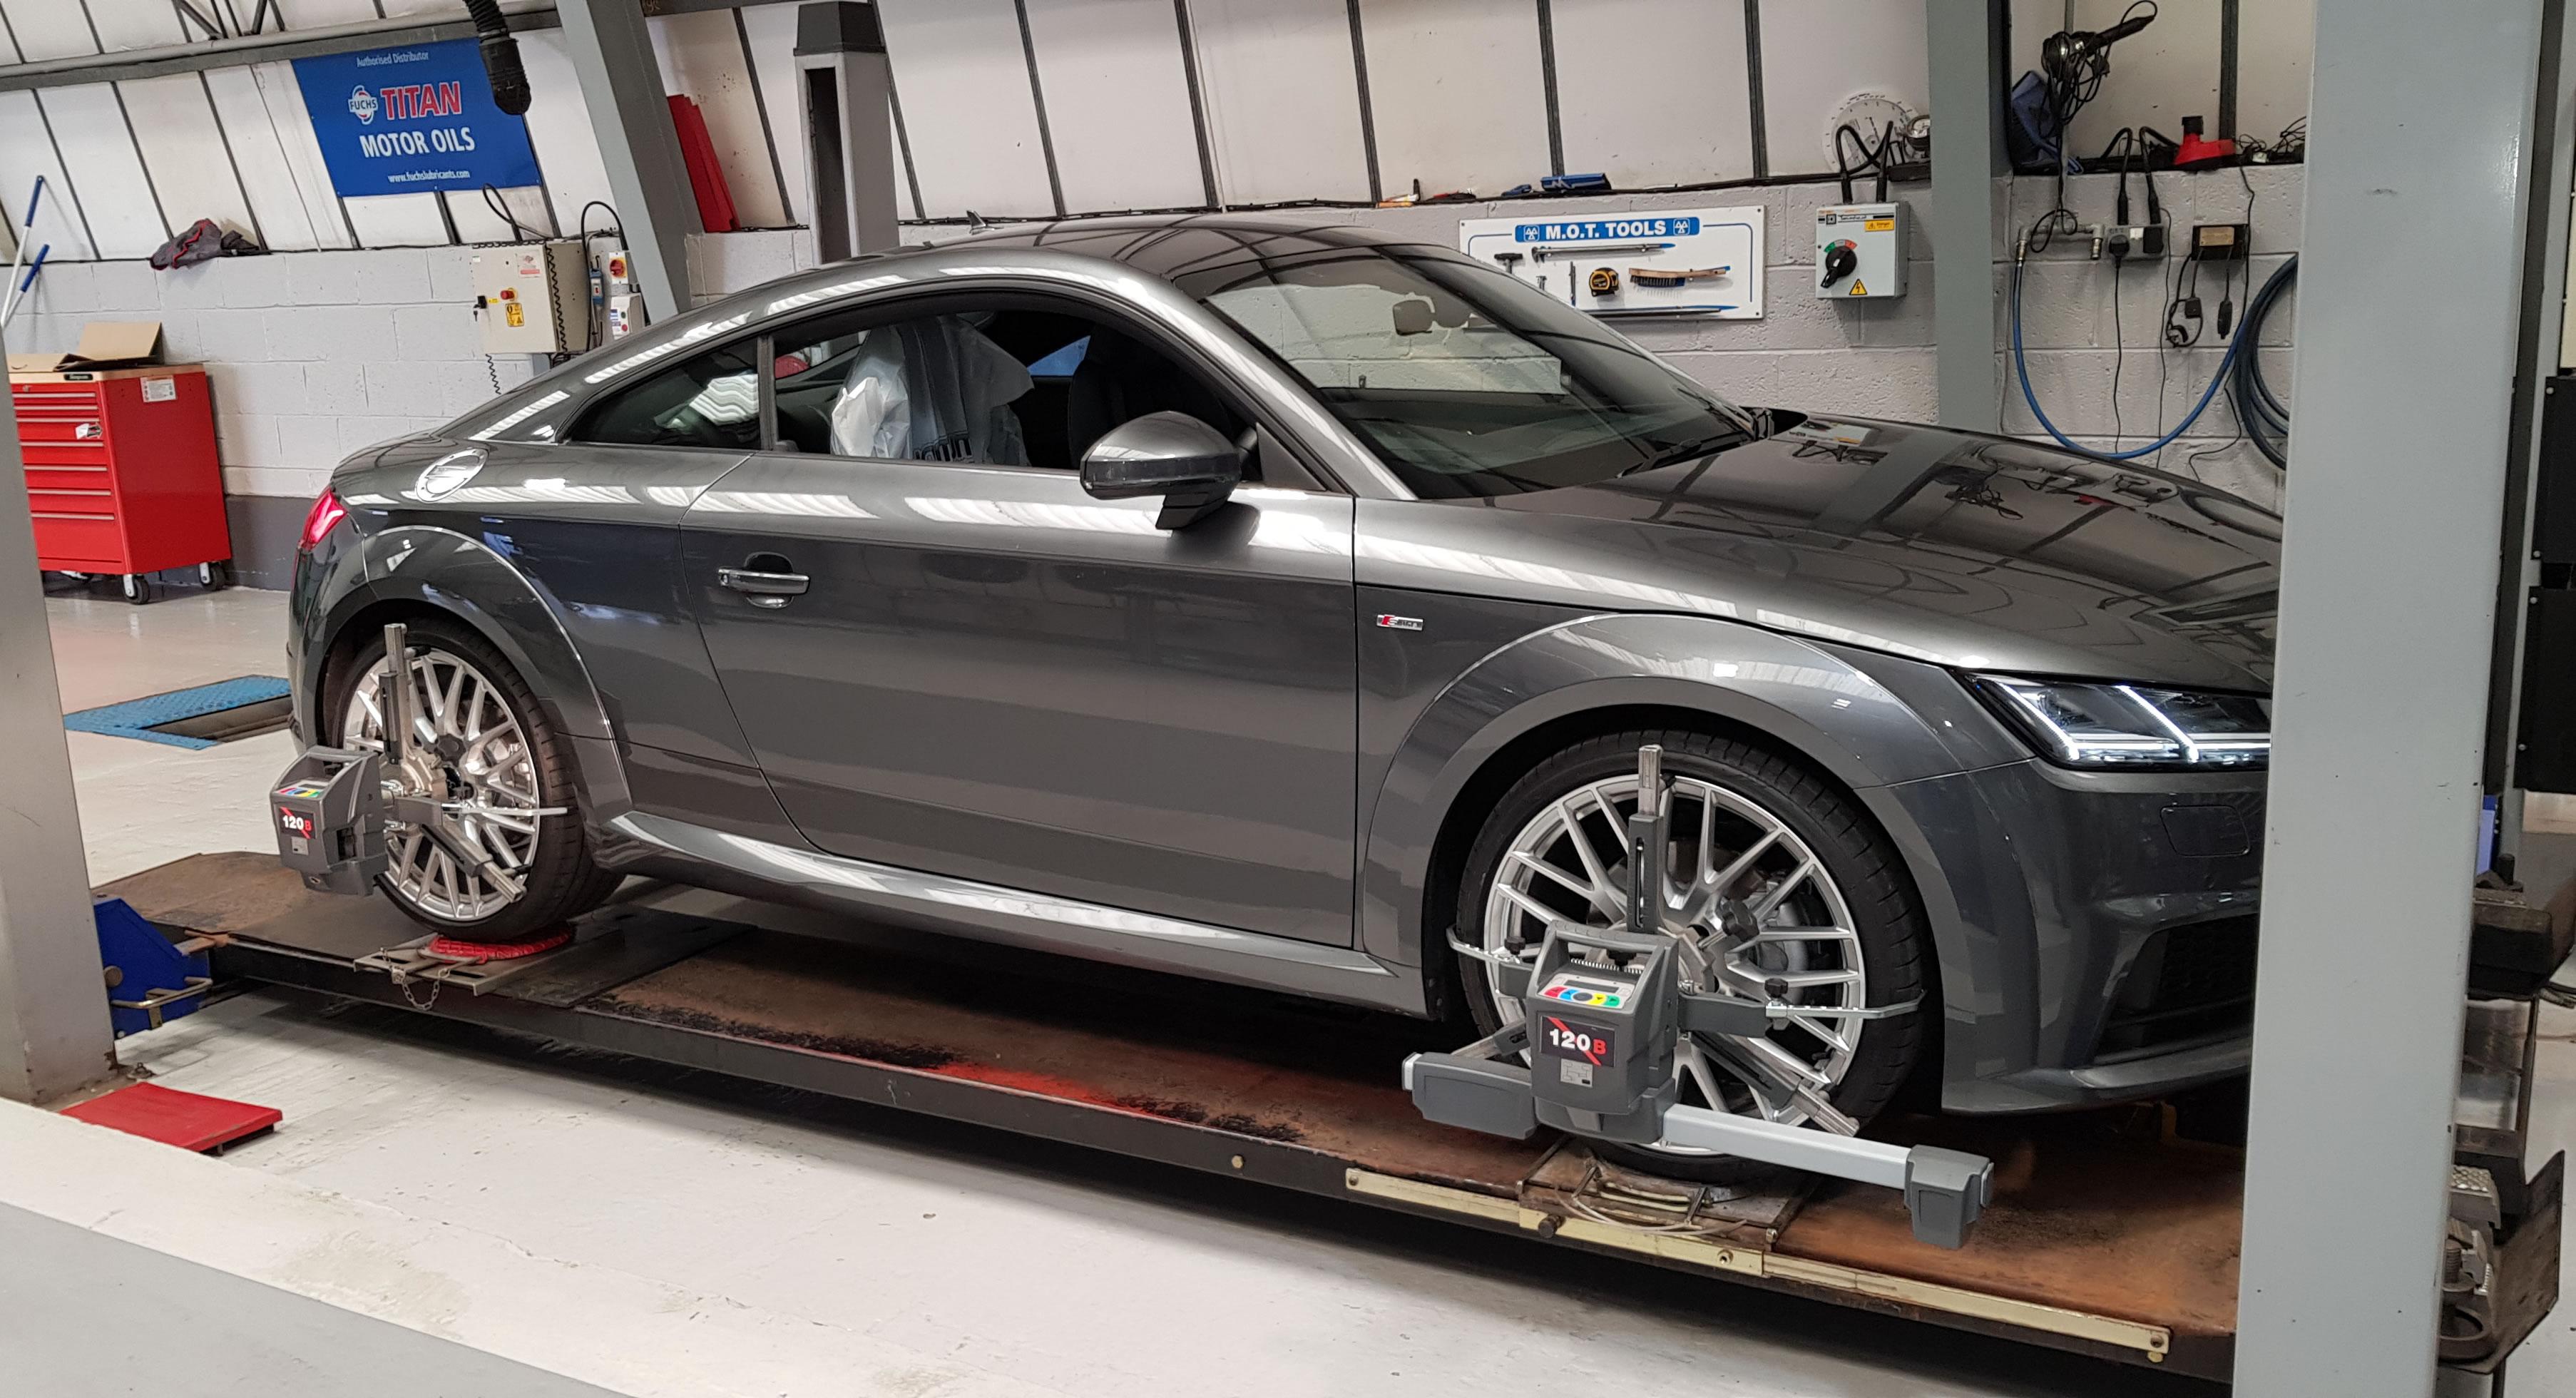 autotecnic - workshop - German Cars - Laser Wheel Alignment